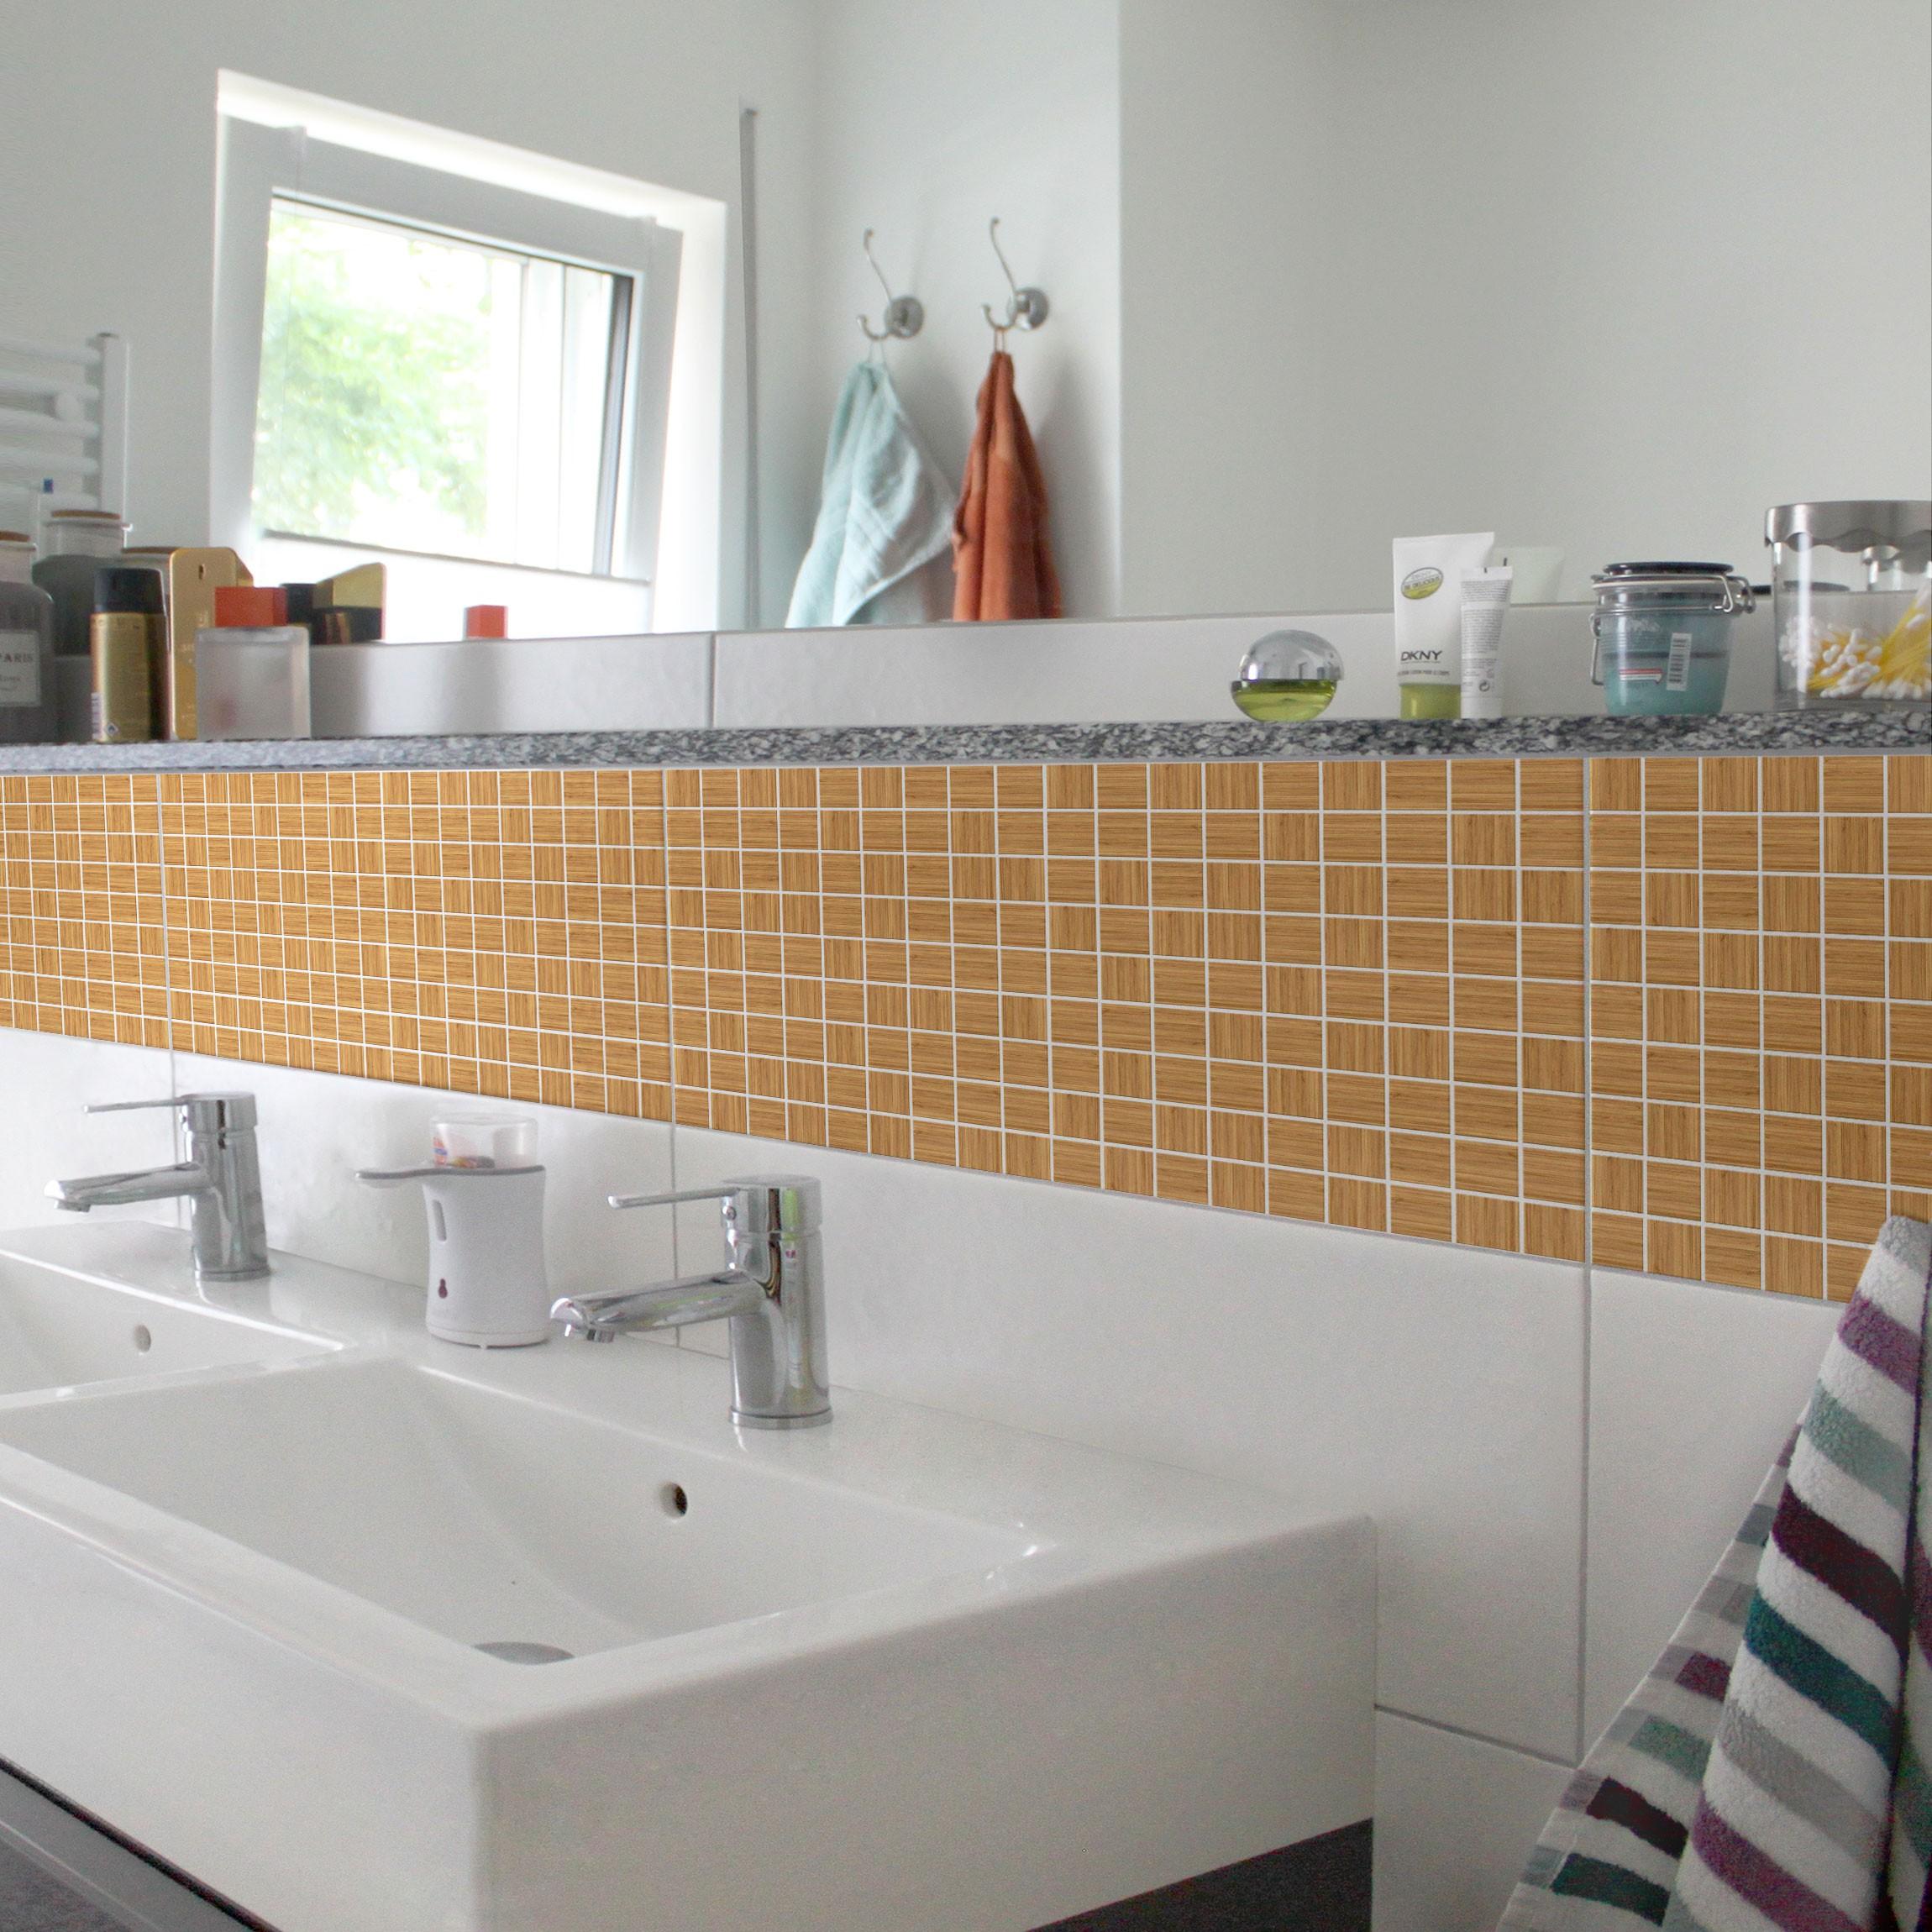 Fliesen Bordüre   Mosaikfliese Holzoptik Weißtanne 30x60 Cm    Fliesenaufkleber